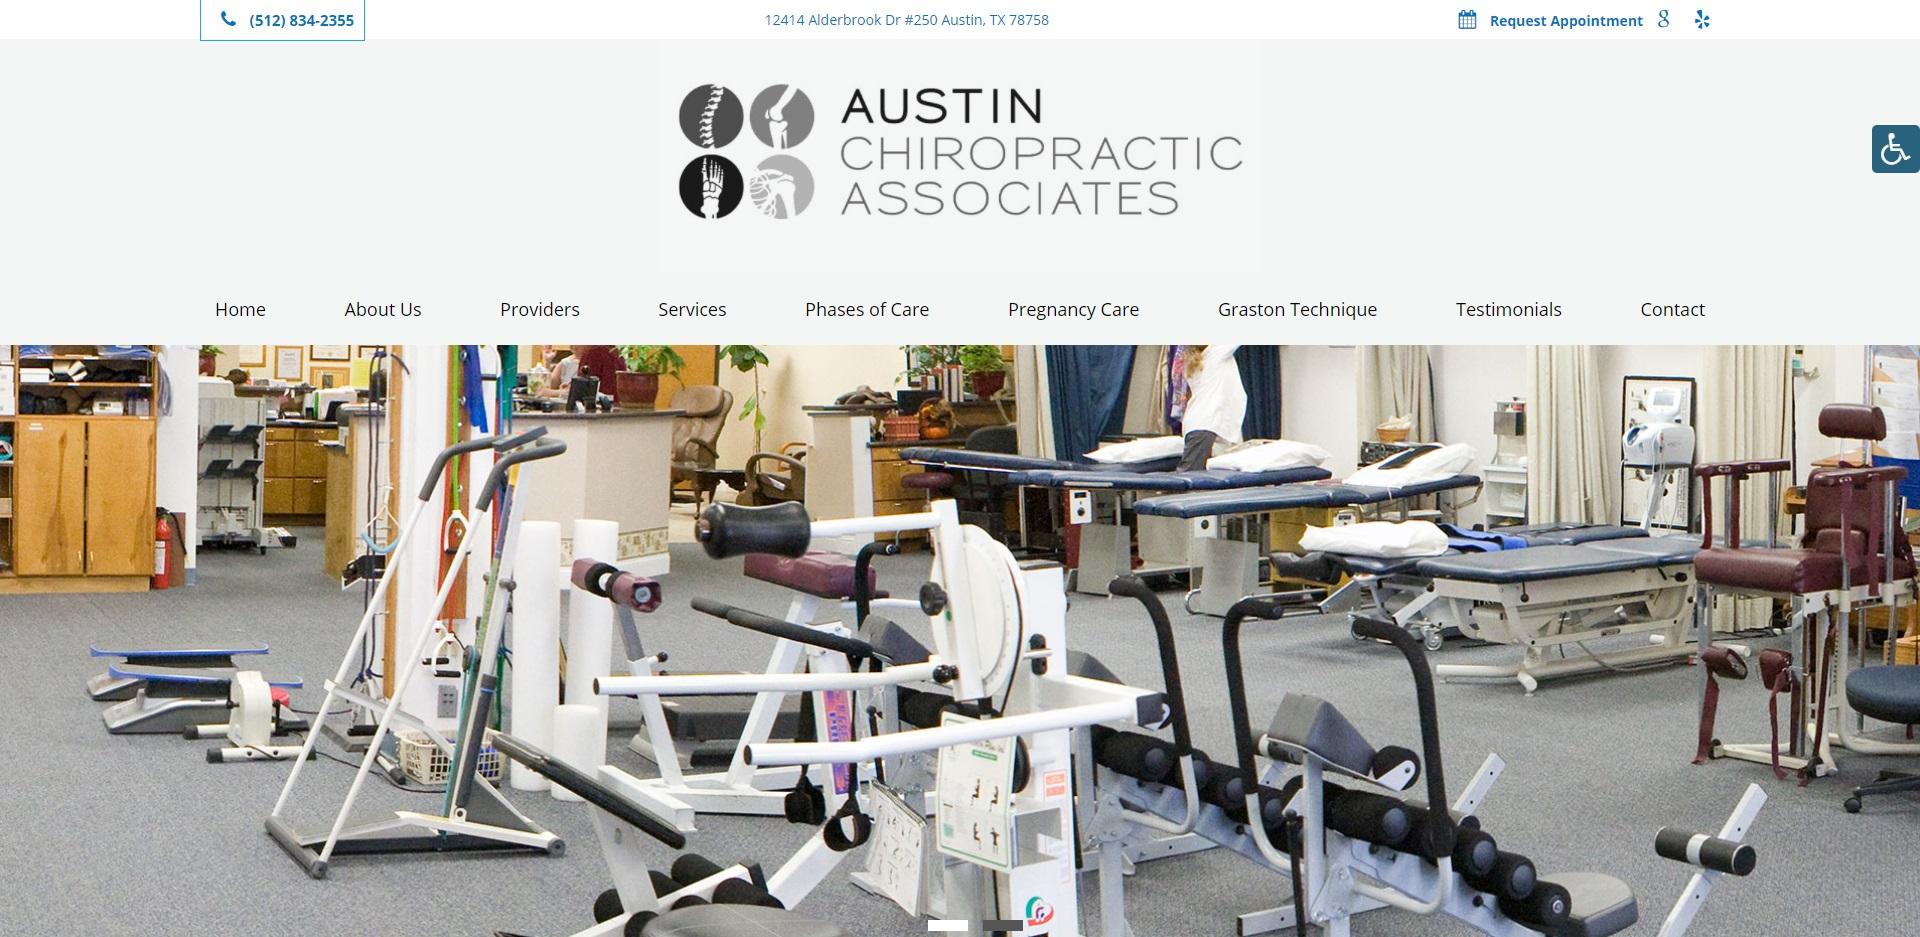 The Best Chiropractors in Austin